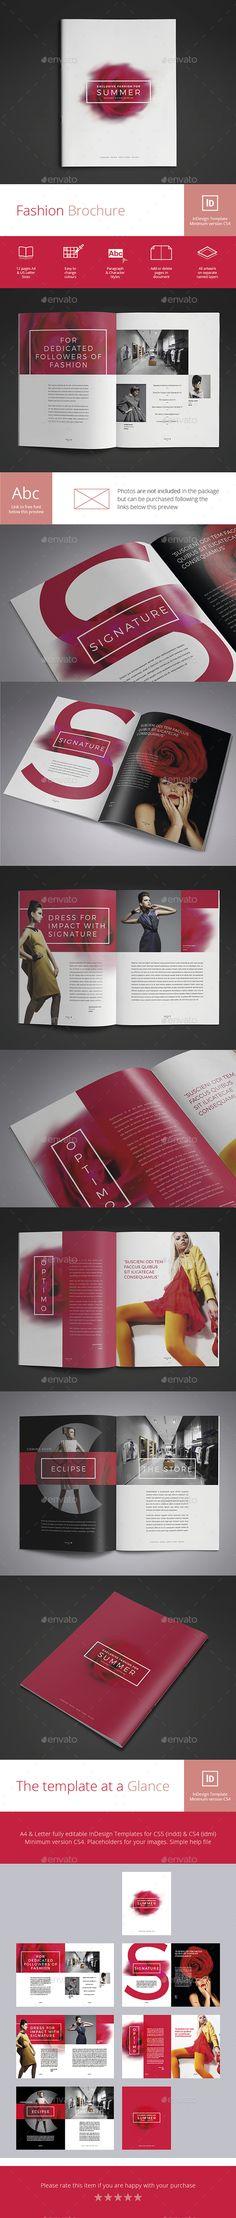 Union - Fashion Lookbook Vol2 Fashion lookbook, Corporate brochure - fashion design brochure template